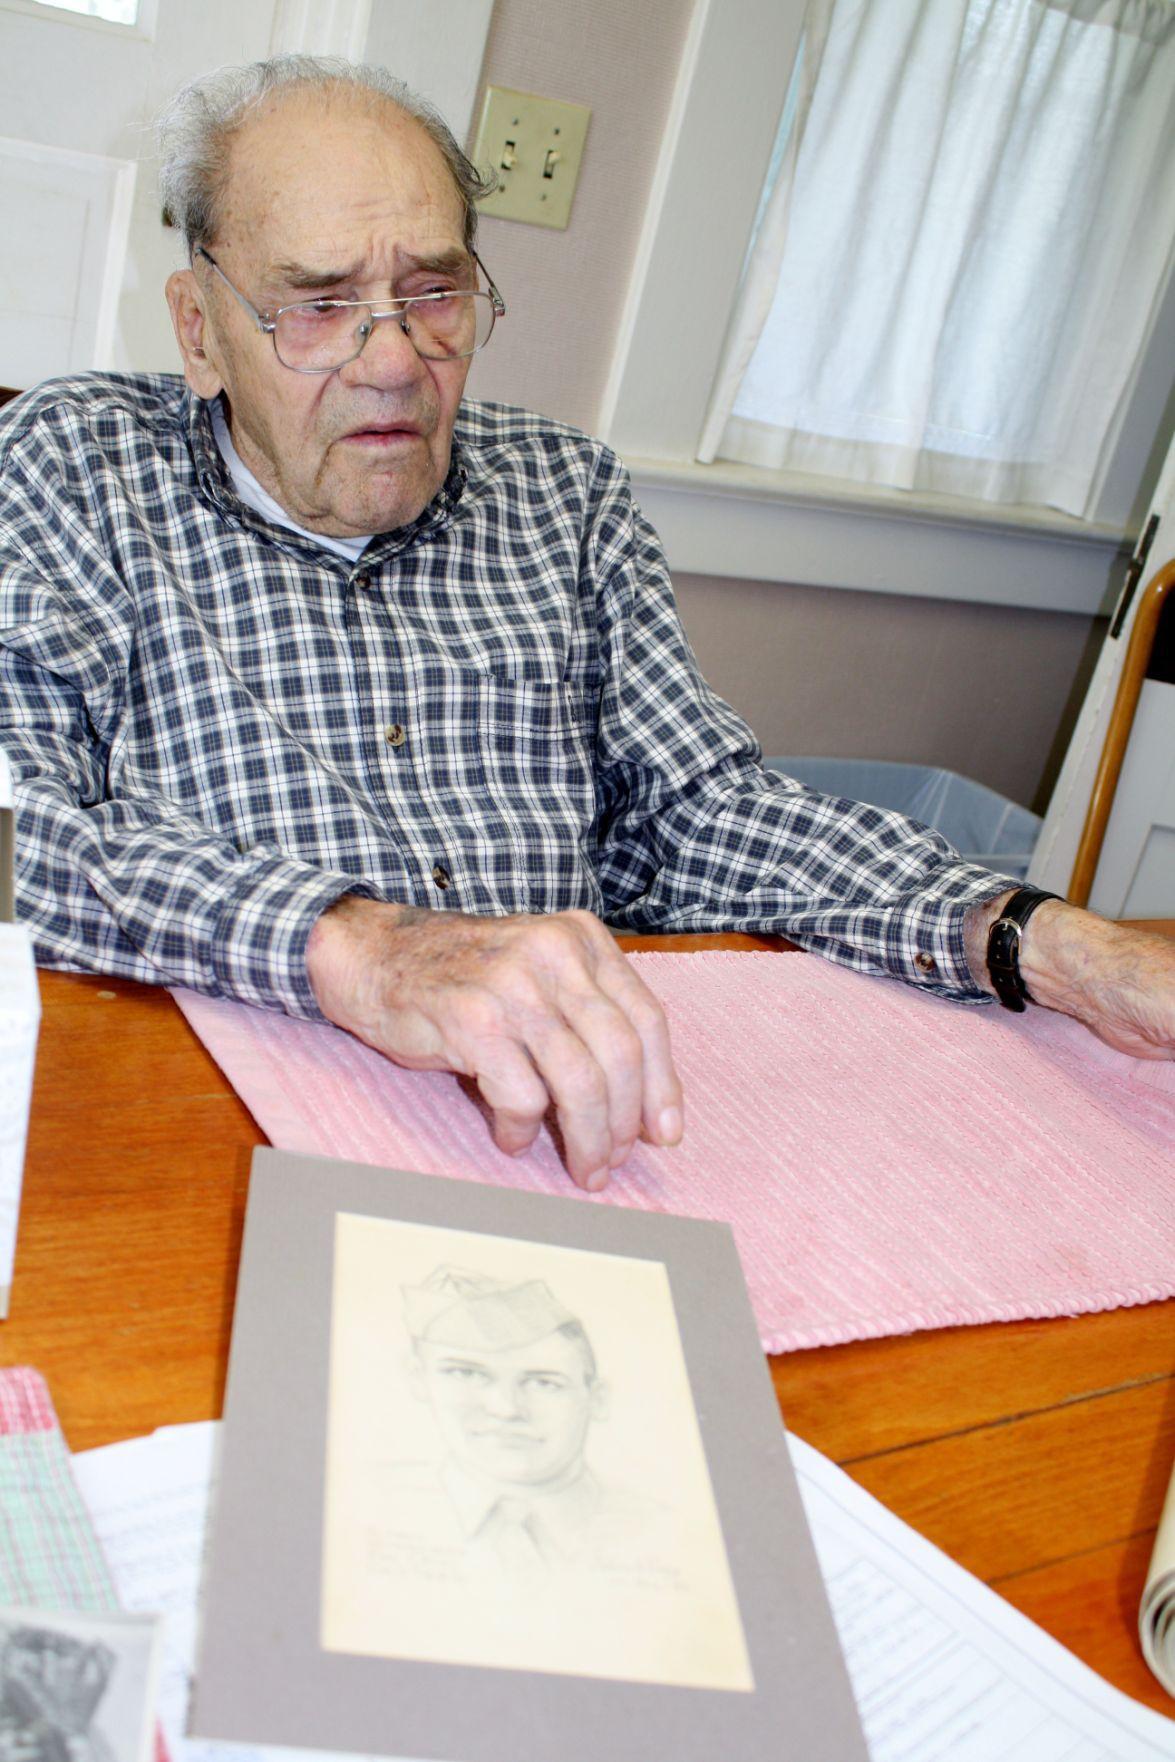 Philip Kurtz with sketch